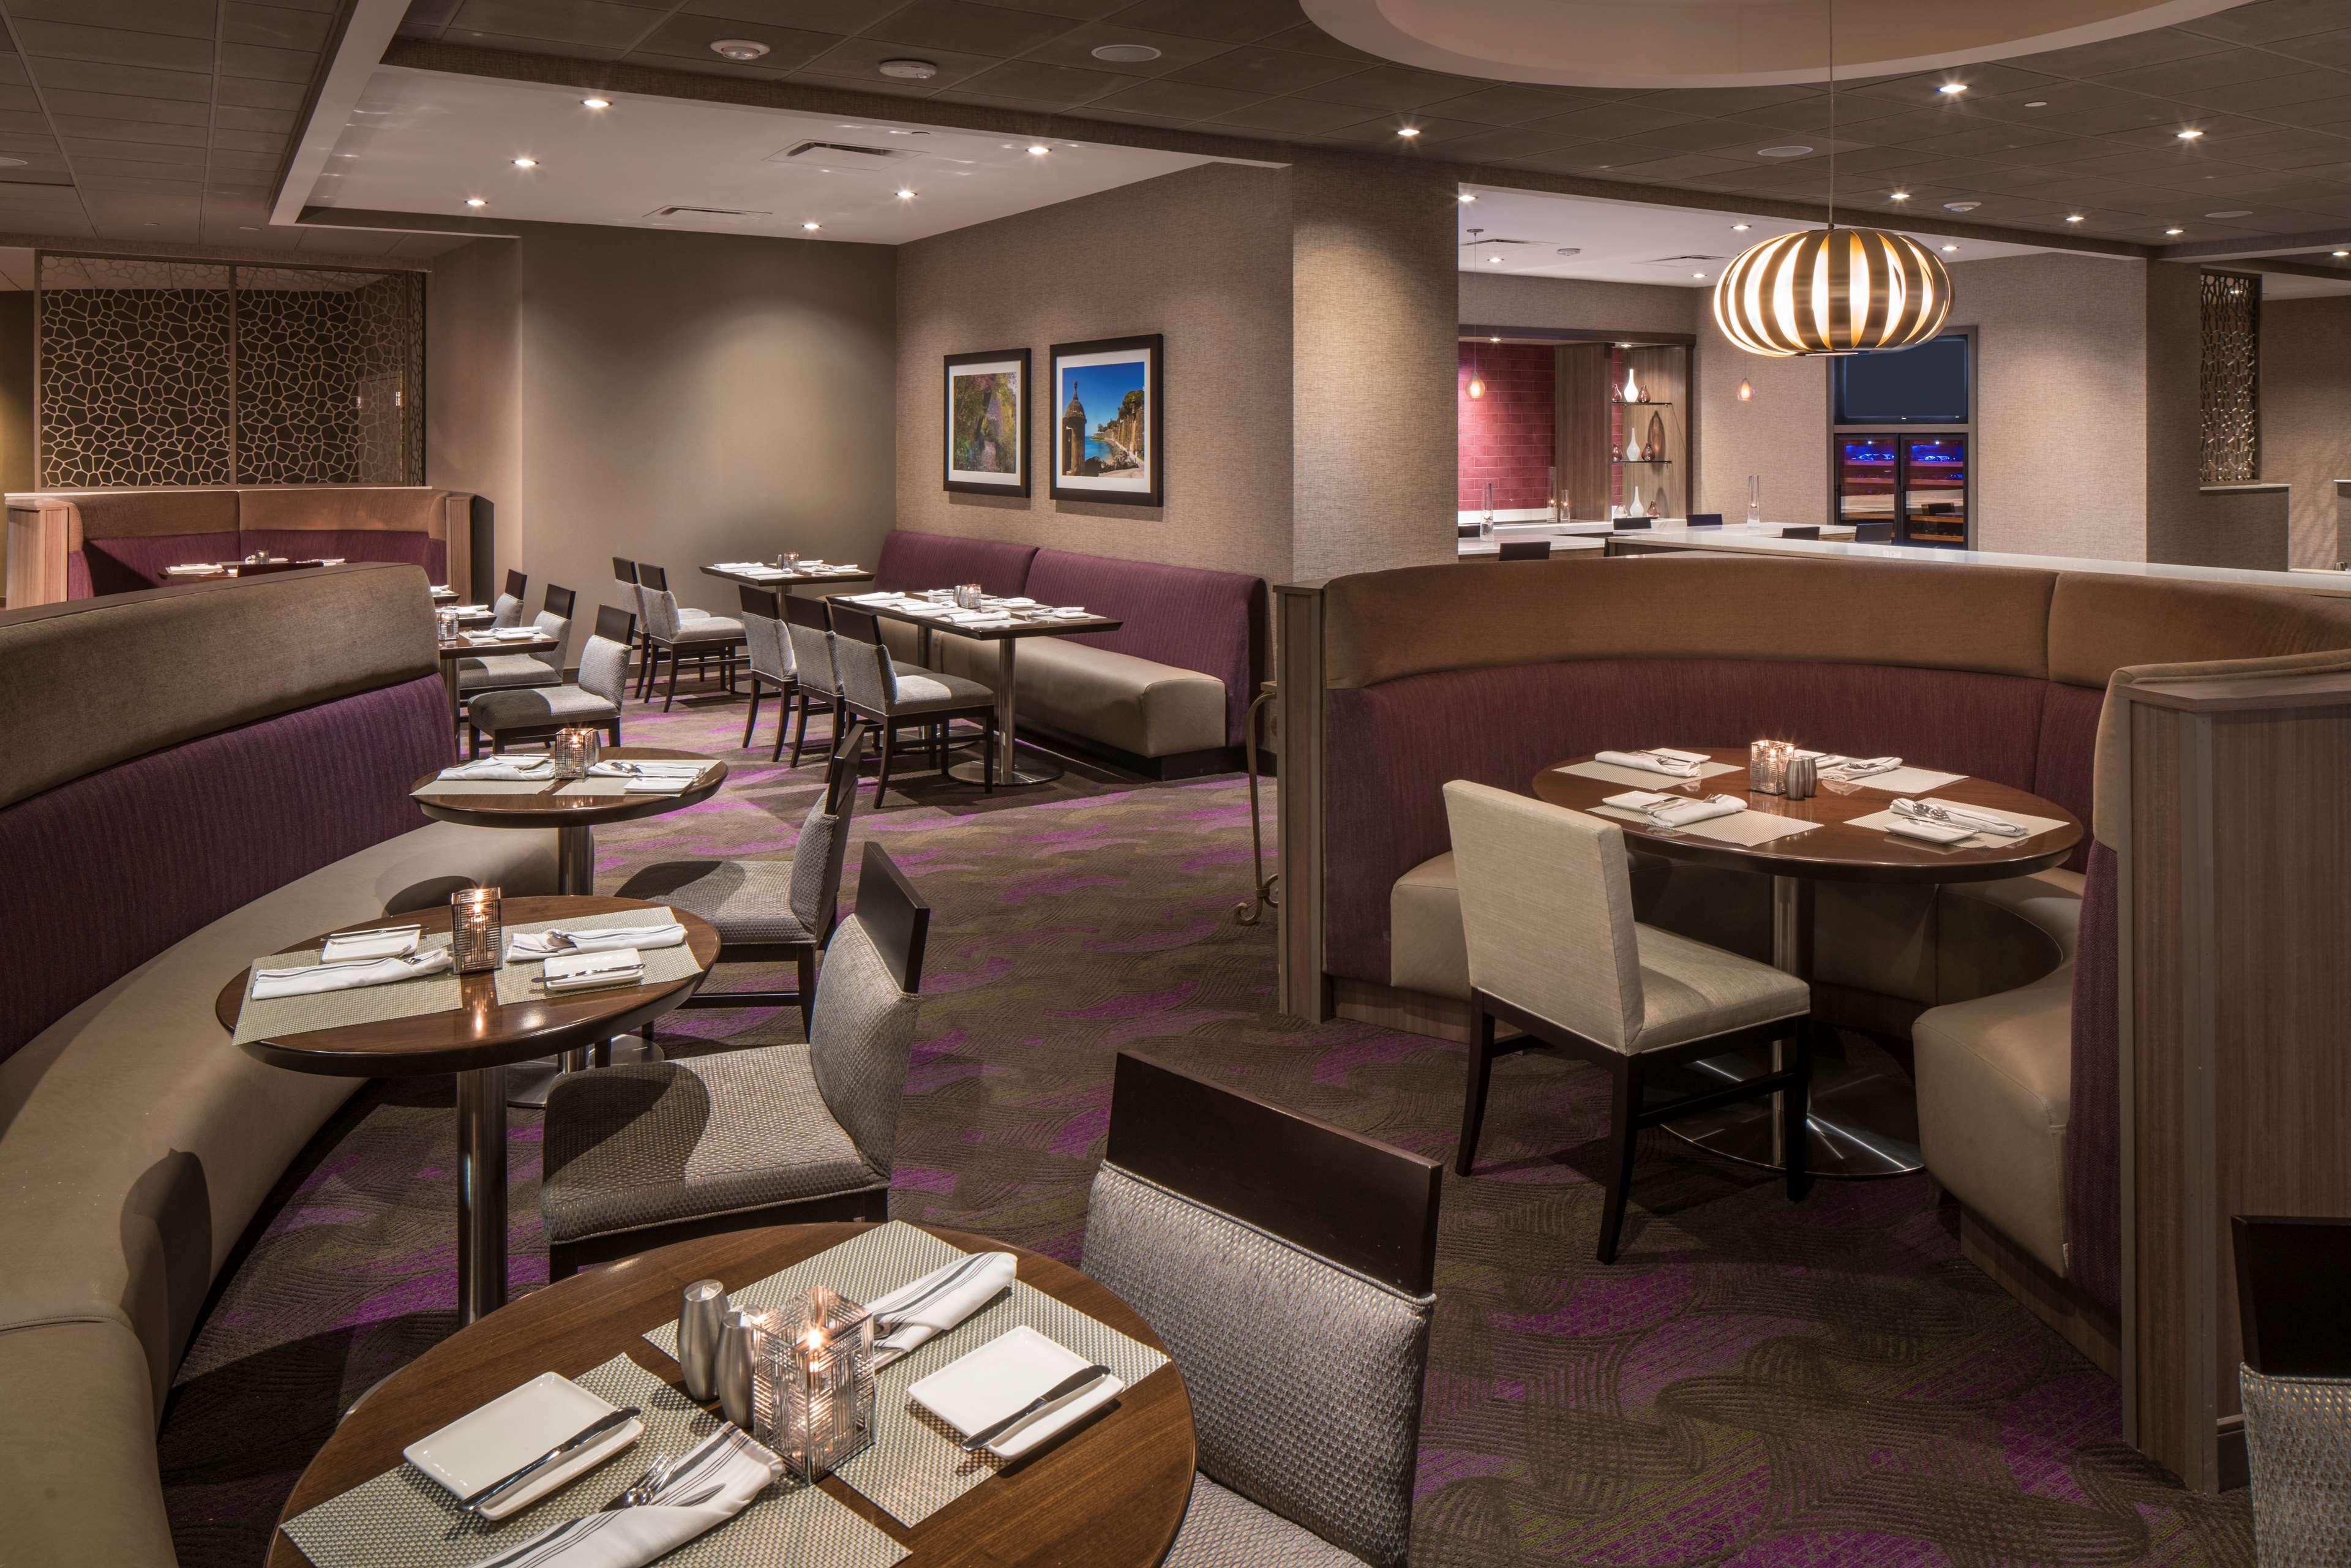 Hilton Washington DC/Rockville Hotel & Executive Meeting Ctr image 20